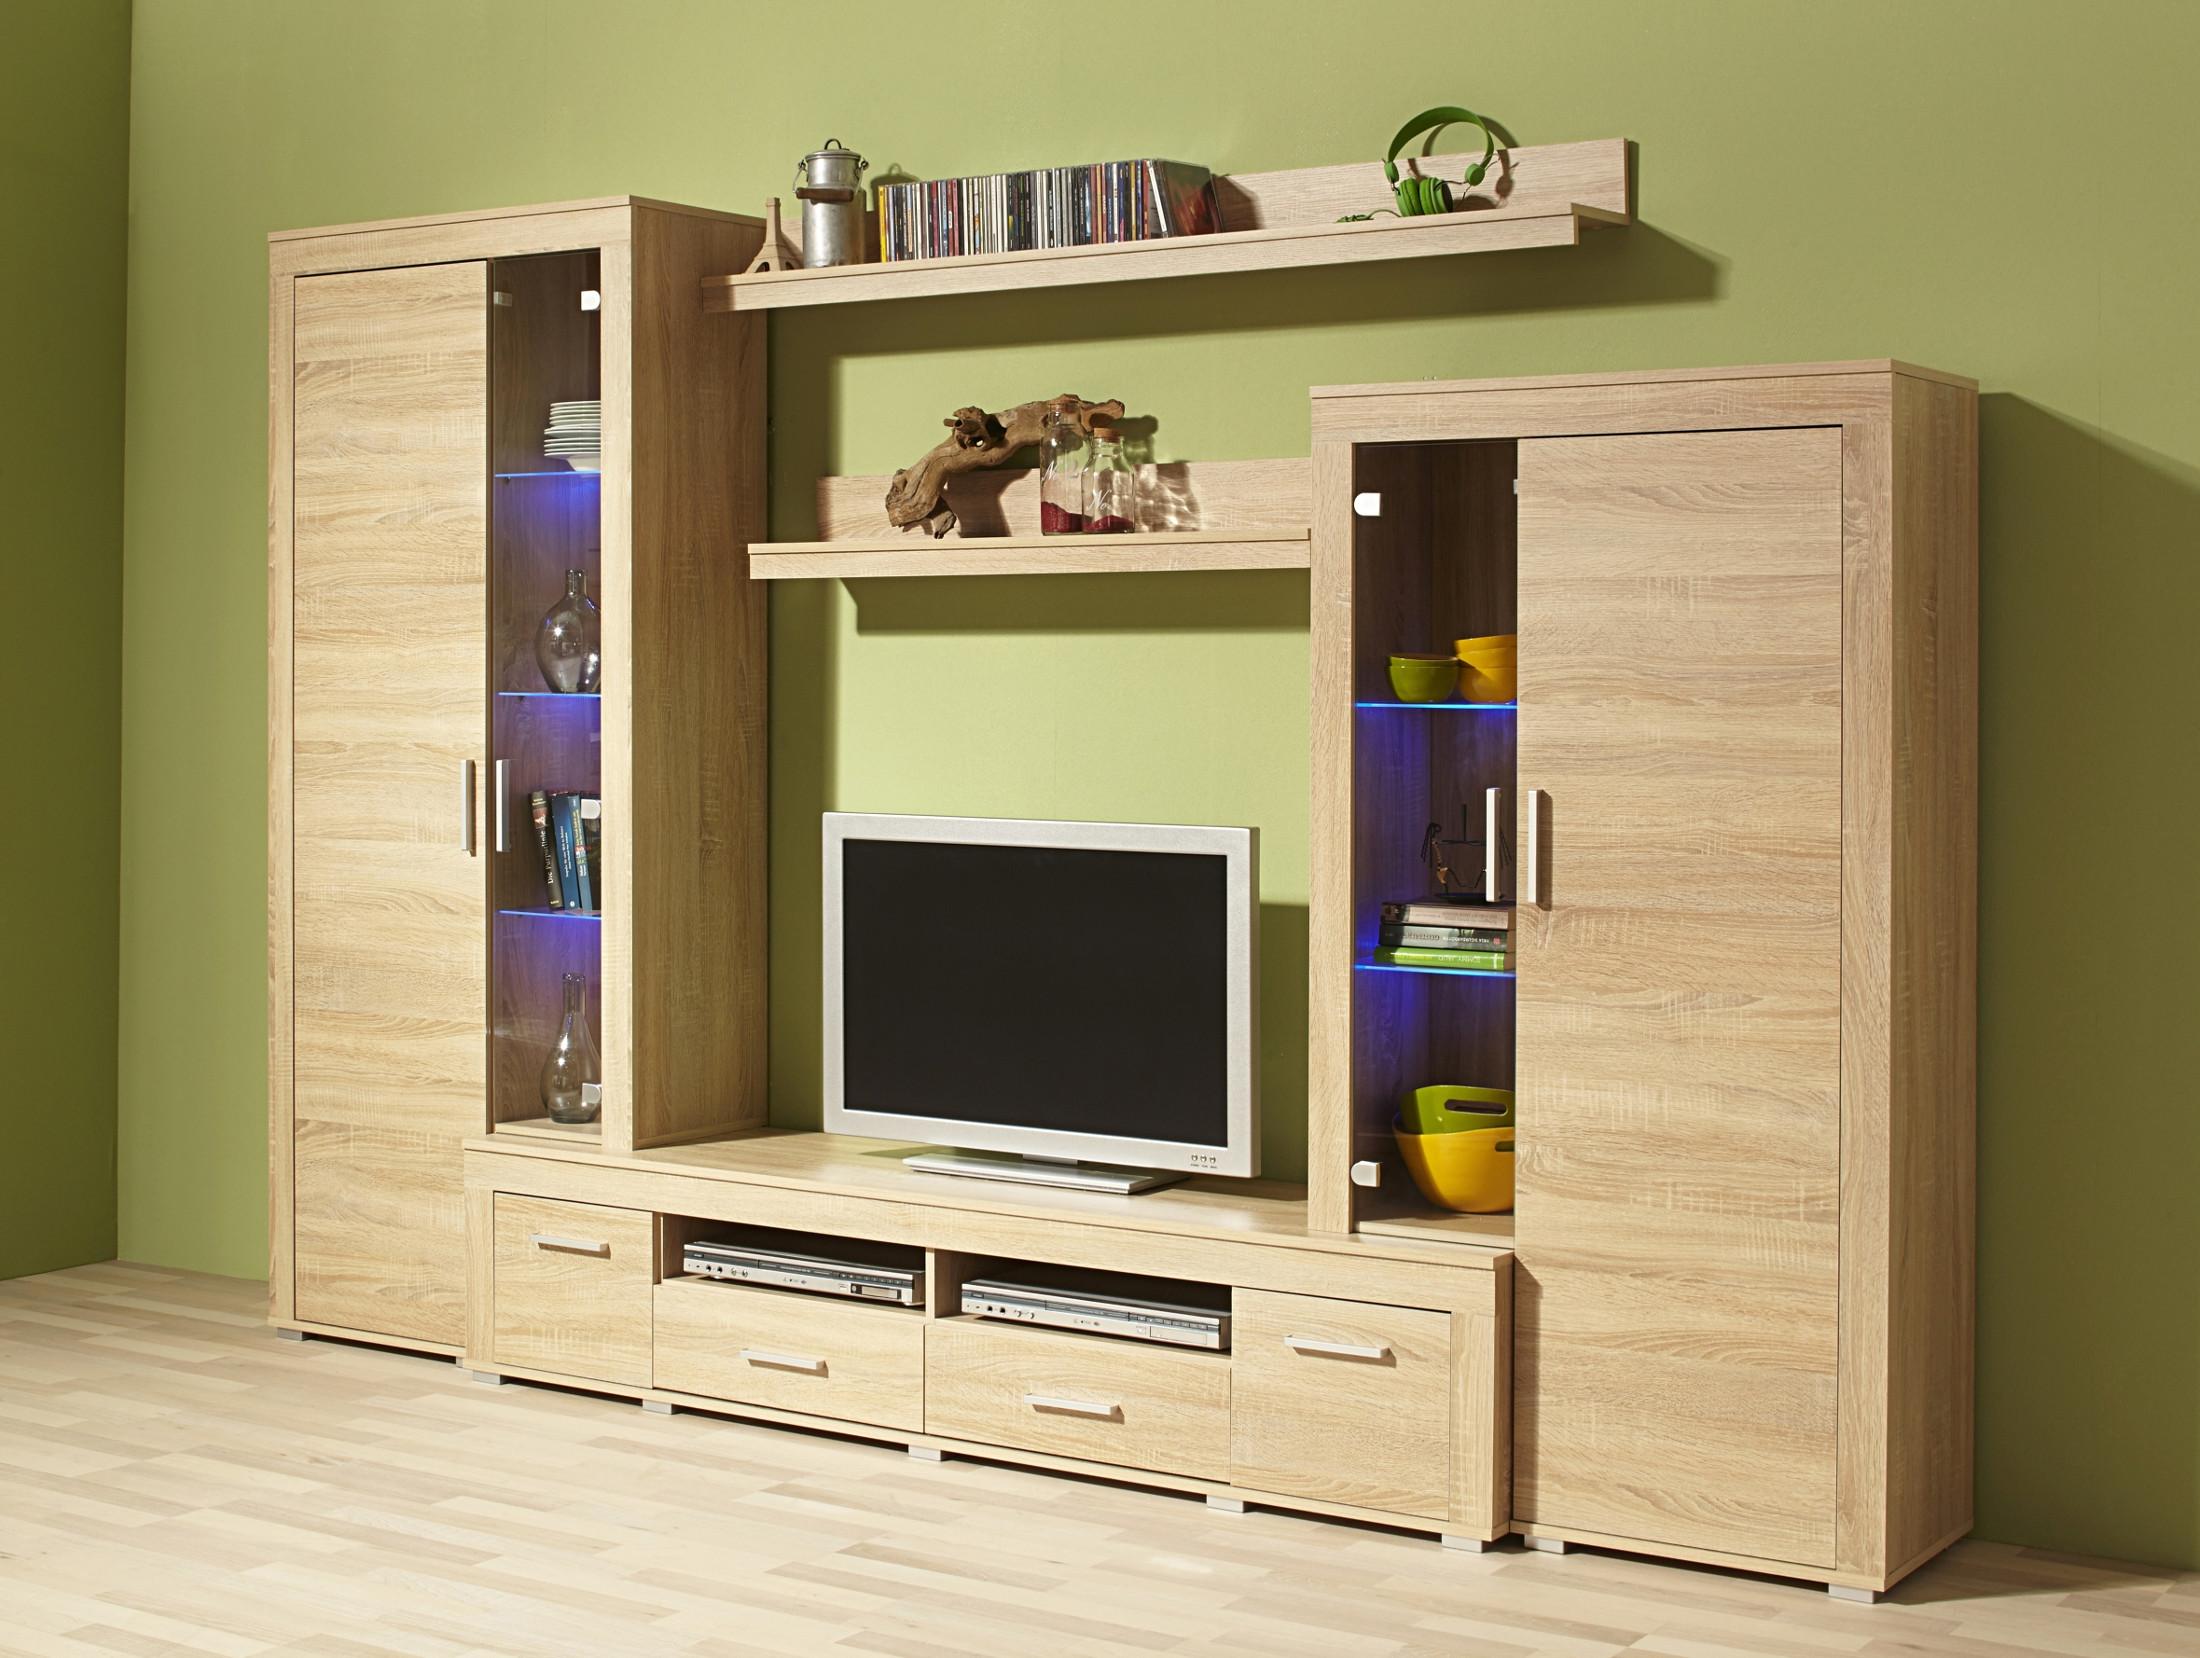 wohnwand malm fix schrankwand anbauwand wohnzimmer 280 cm. Black Bedroom Furniture Sets. Home Design Ideas